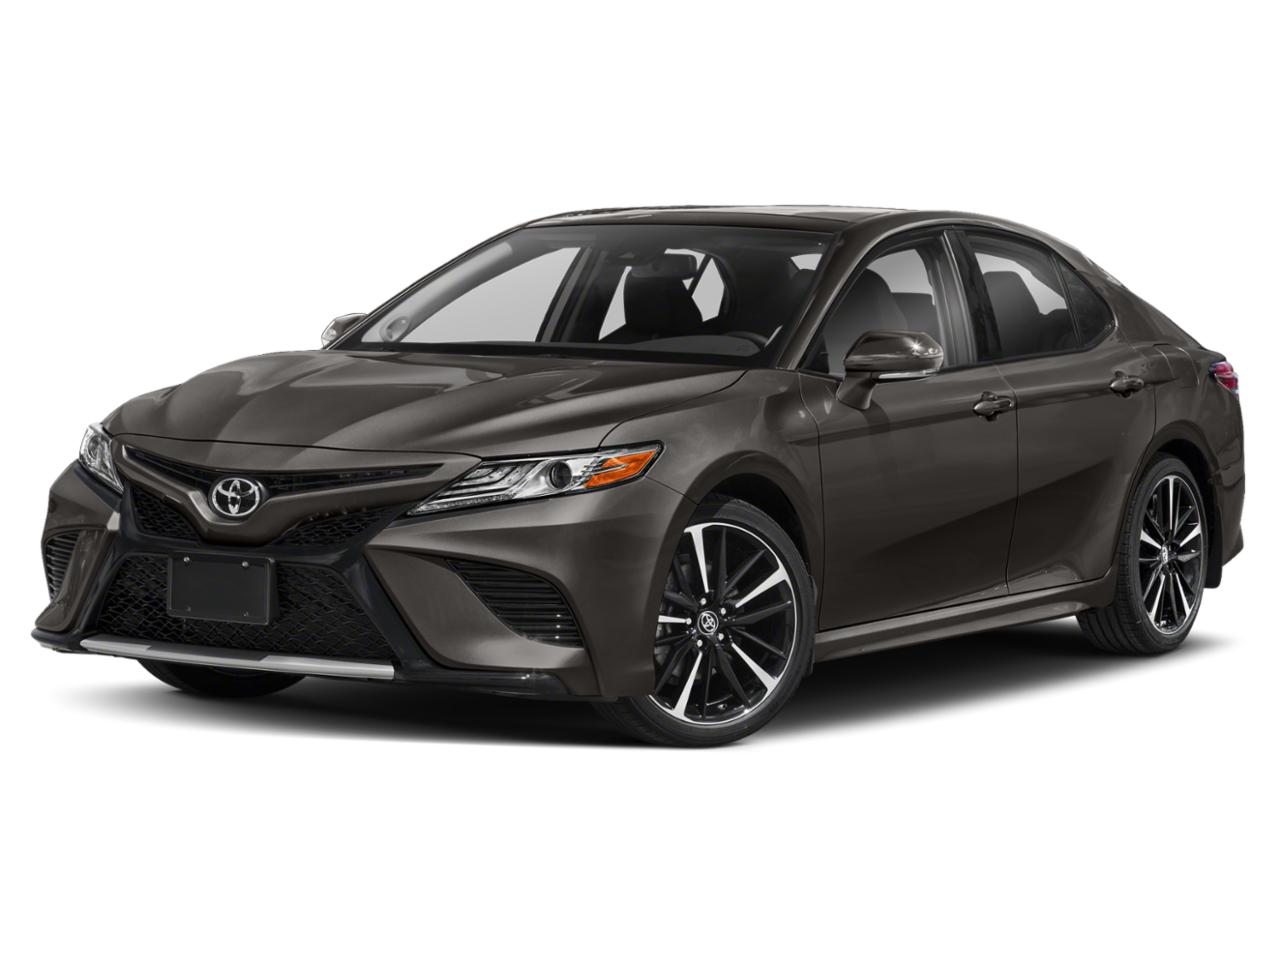 2020 Toyota Camry XSE V6 4dr Car Slide